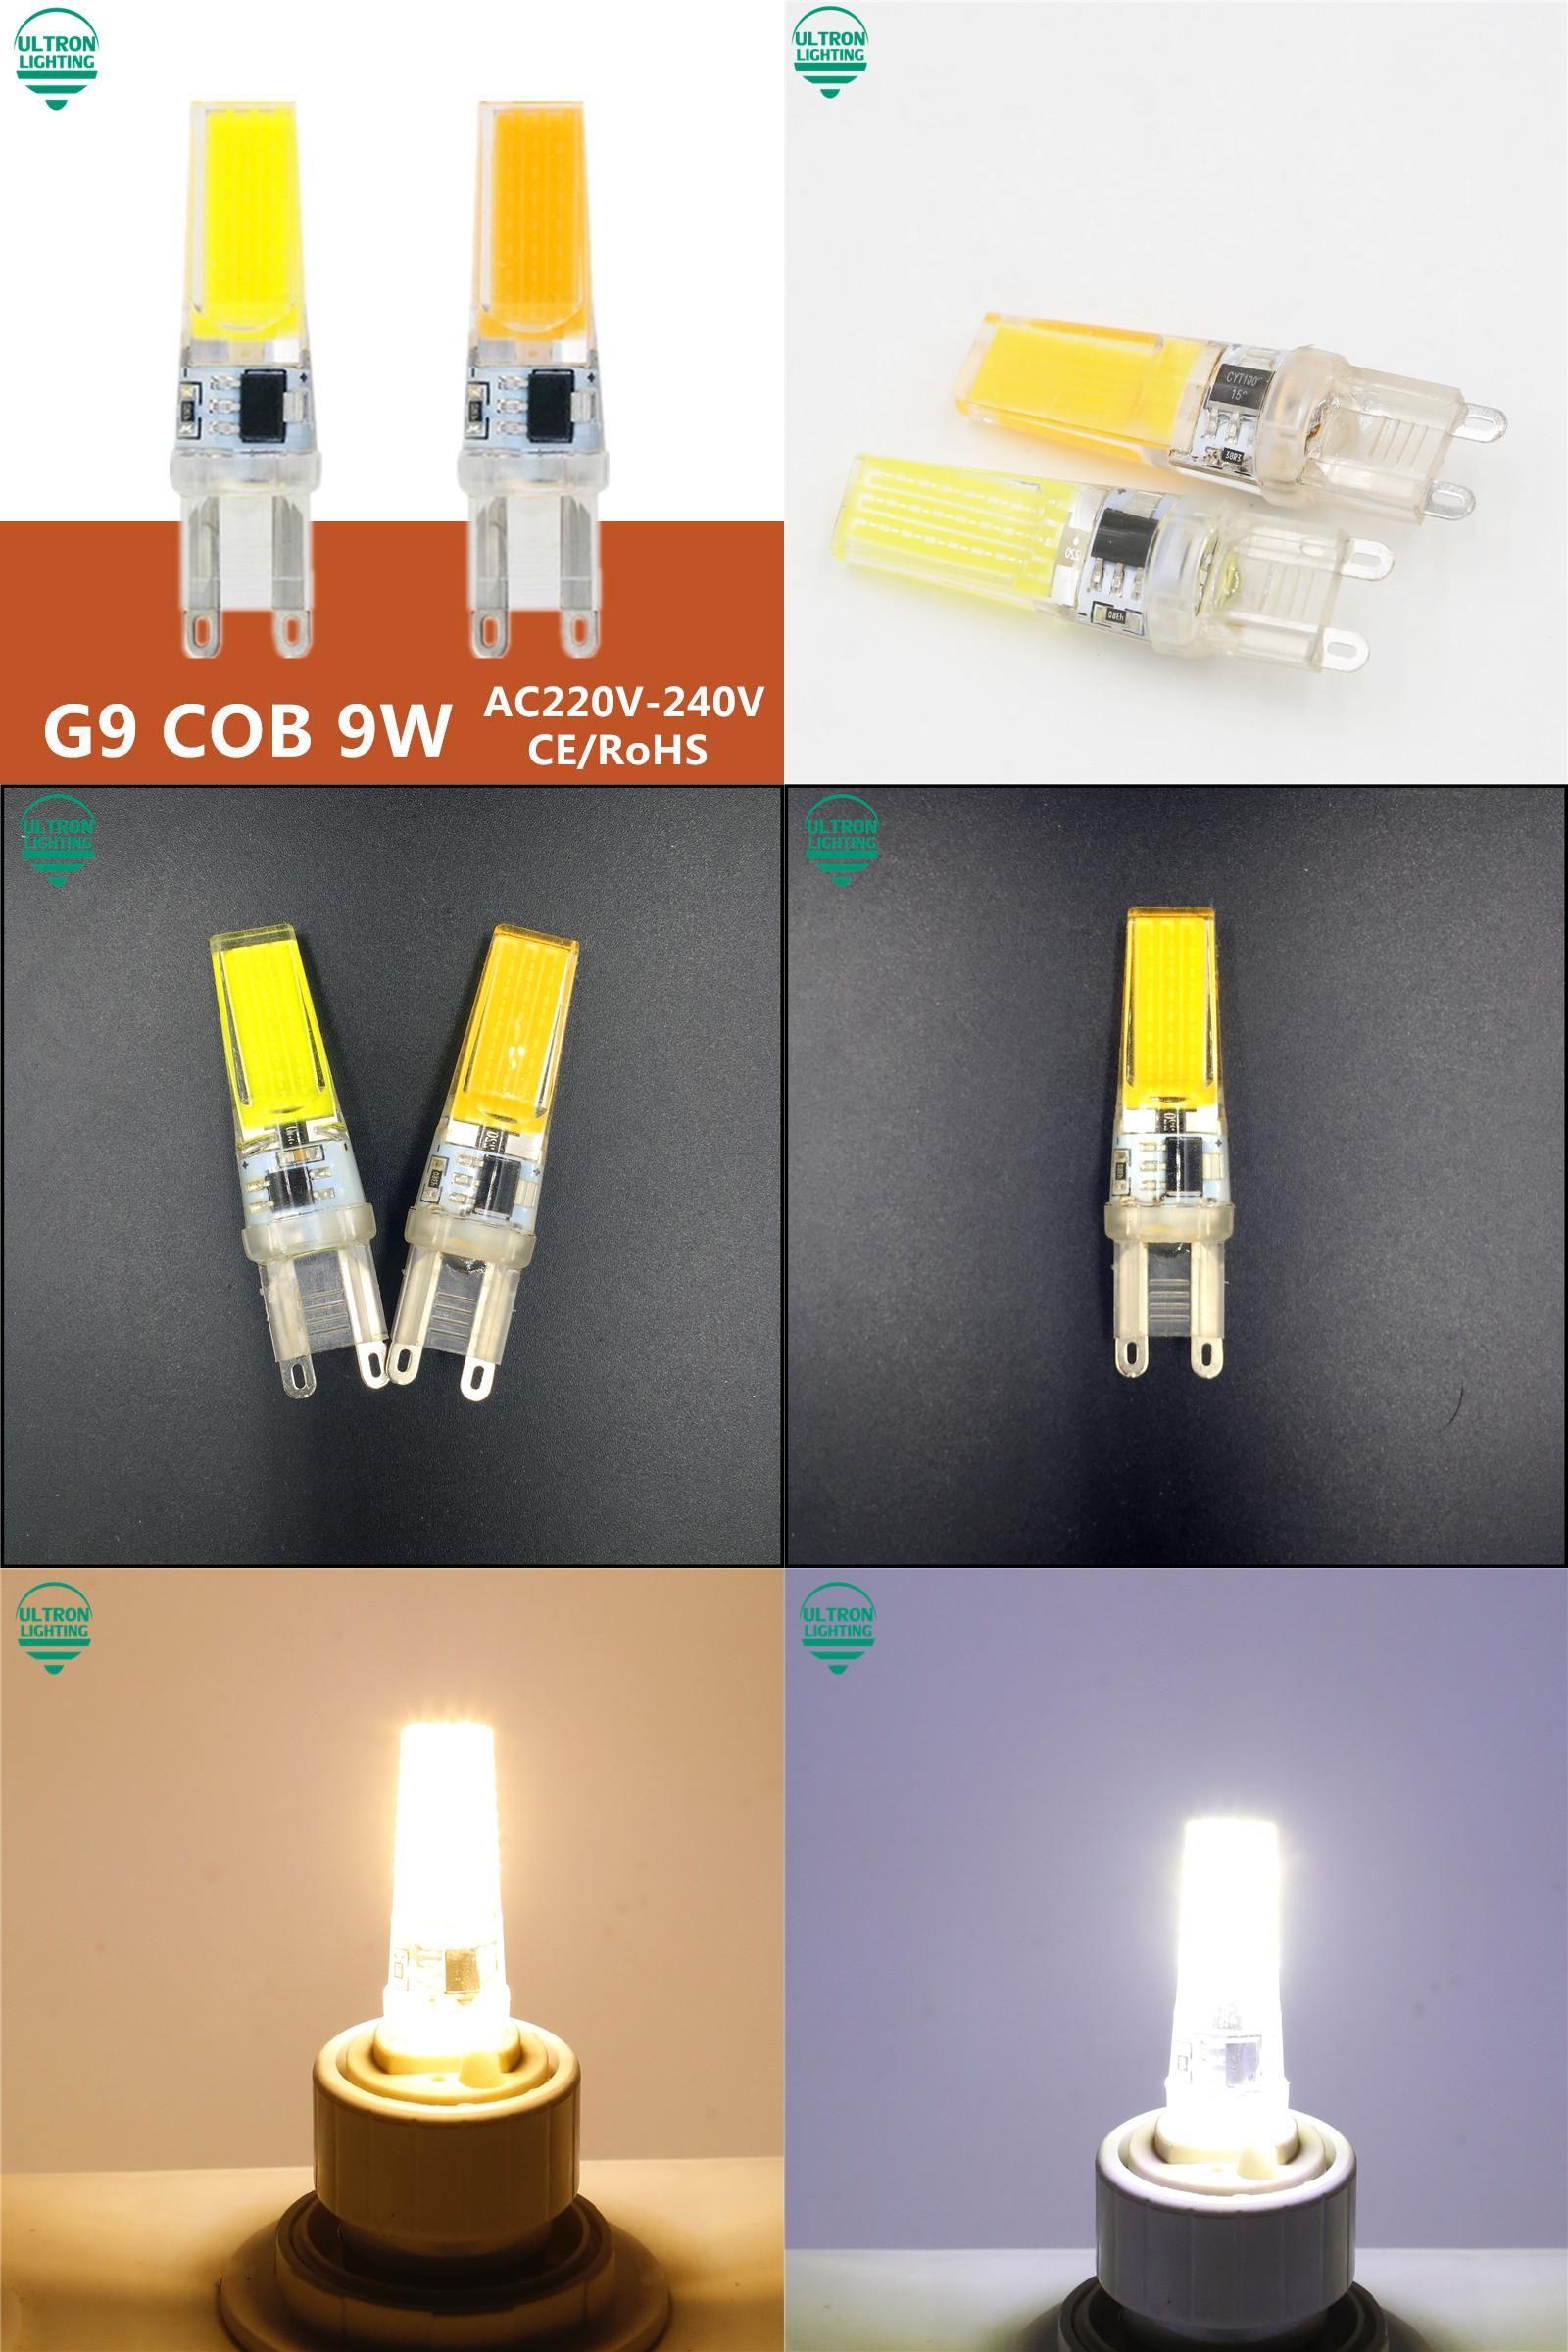 Visit To Buy G9 Led Lamp Bulb 220v 9w Cob Smd Led Lighting Lights Replace Halogen Spotlight Chandelier Light 230v 240v Lampada L Lamp Bulb Led Lights G9 Led